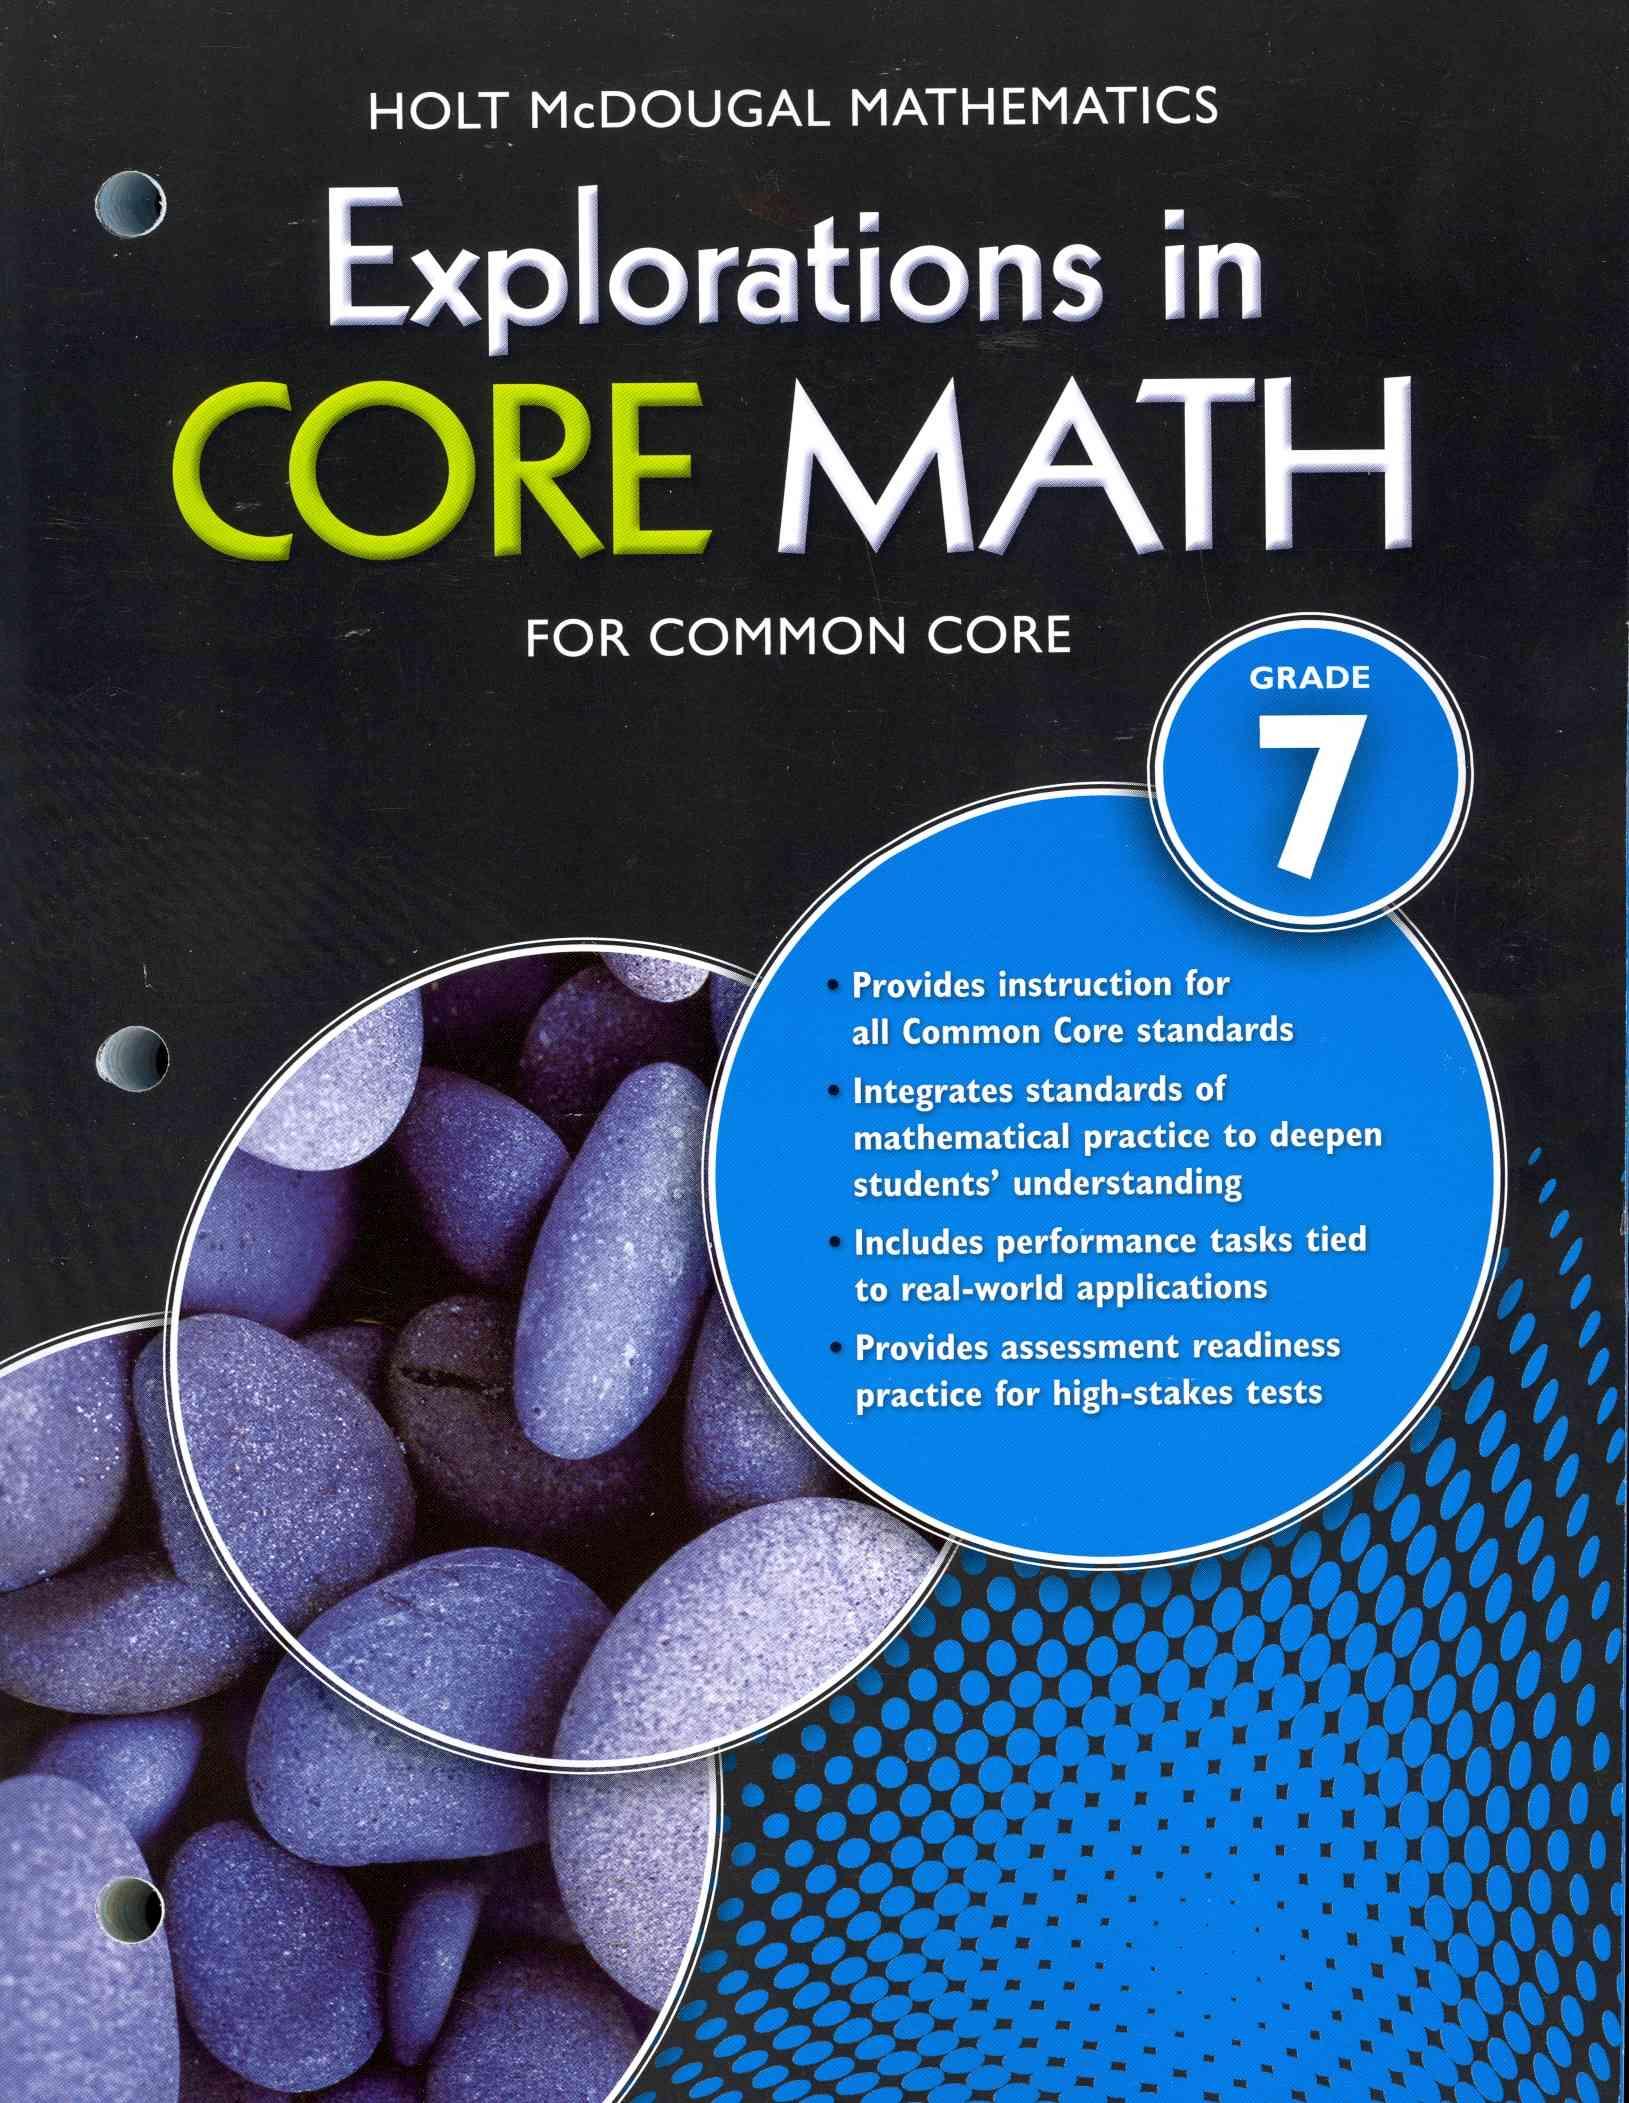 Mathematics Explorations In Core Math For Common Core